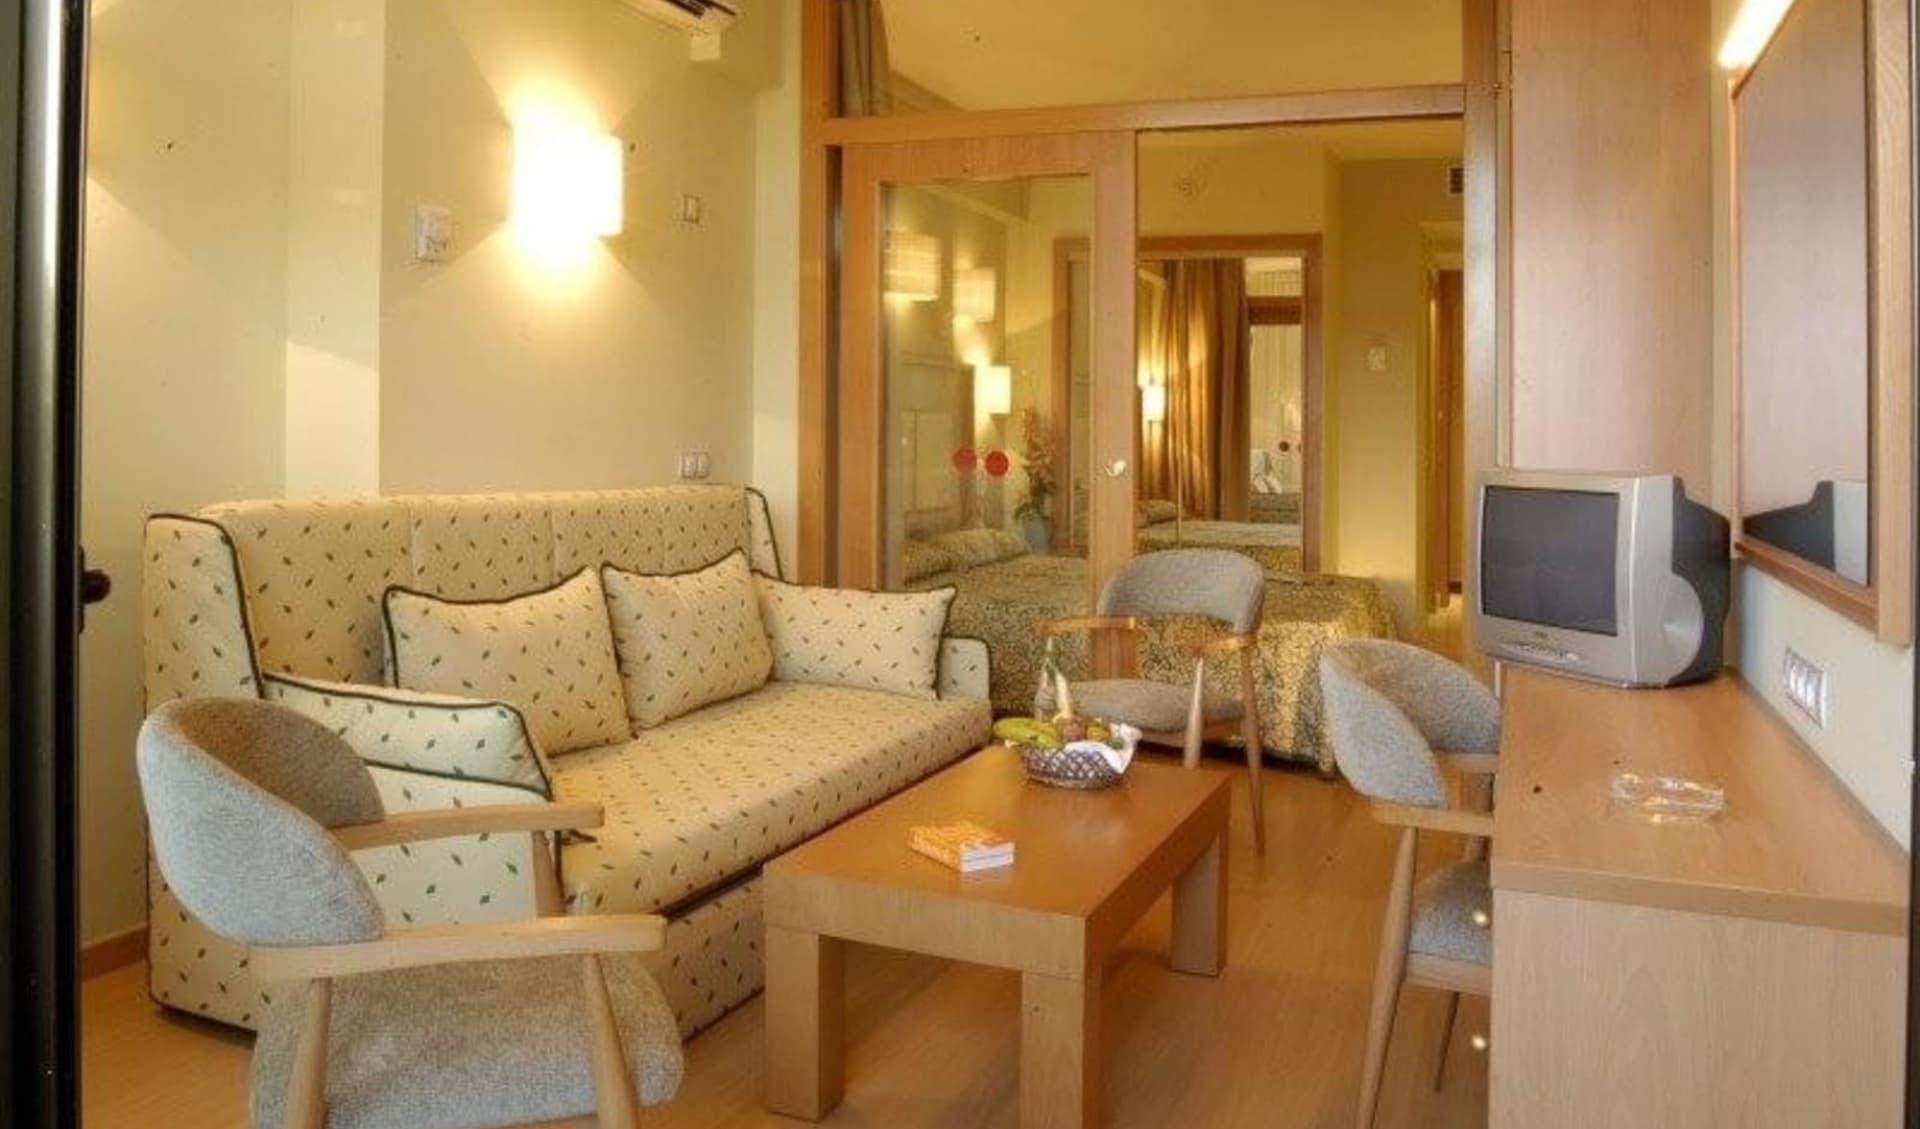 Lloret de Mar - Hotel Olympic Suites & Palace ab Costa Brava: Zimmer 1